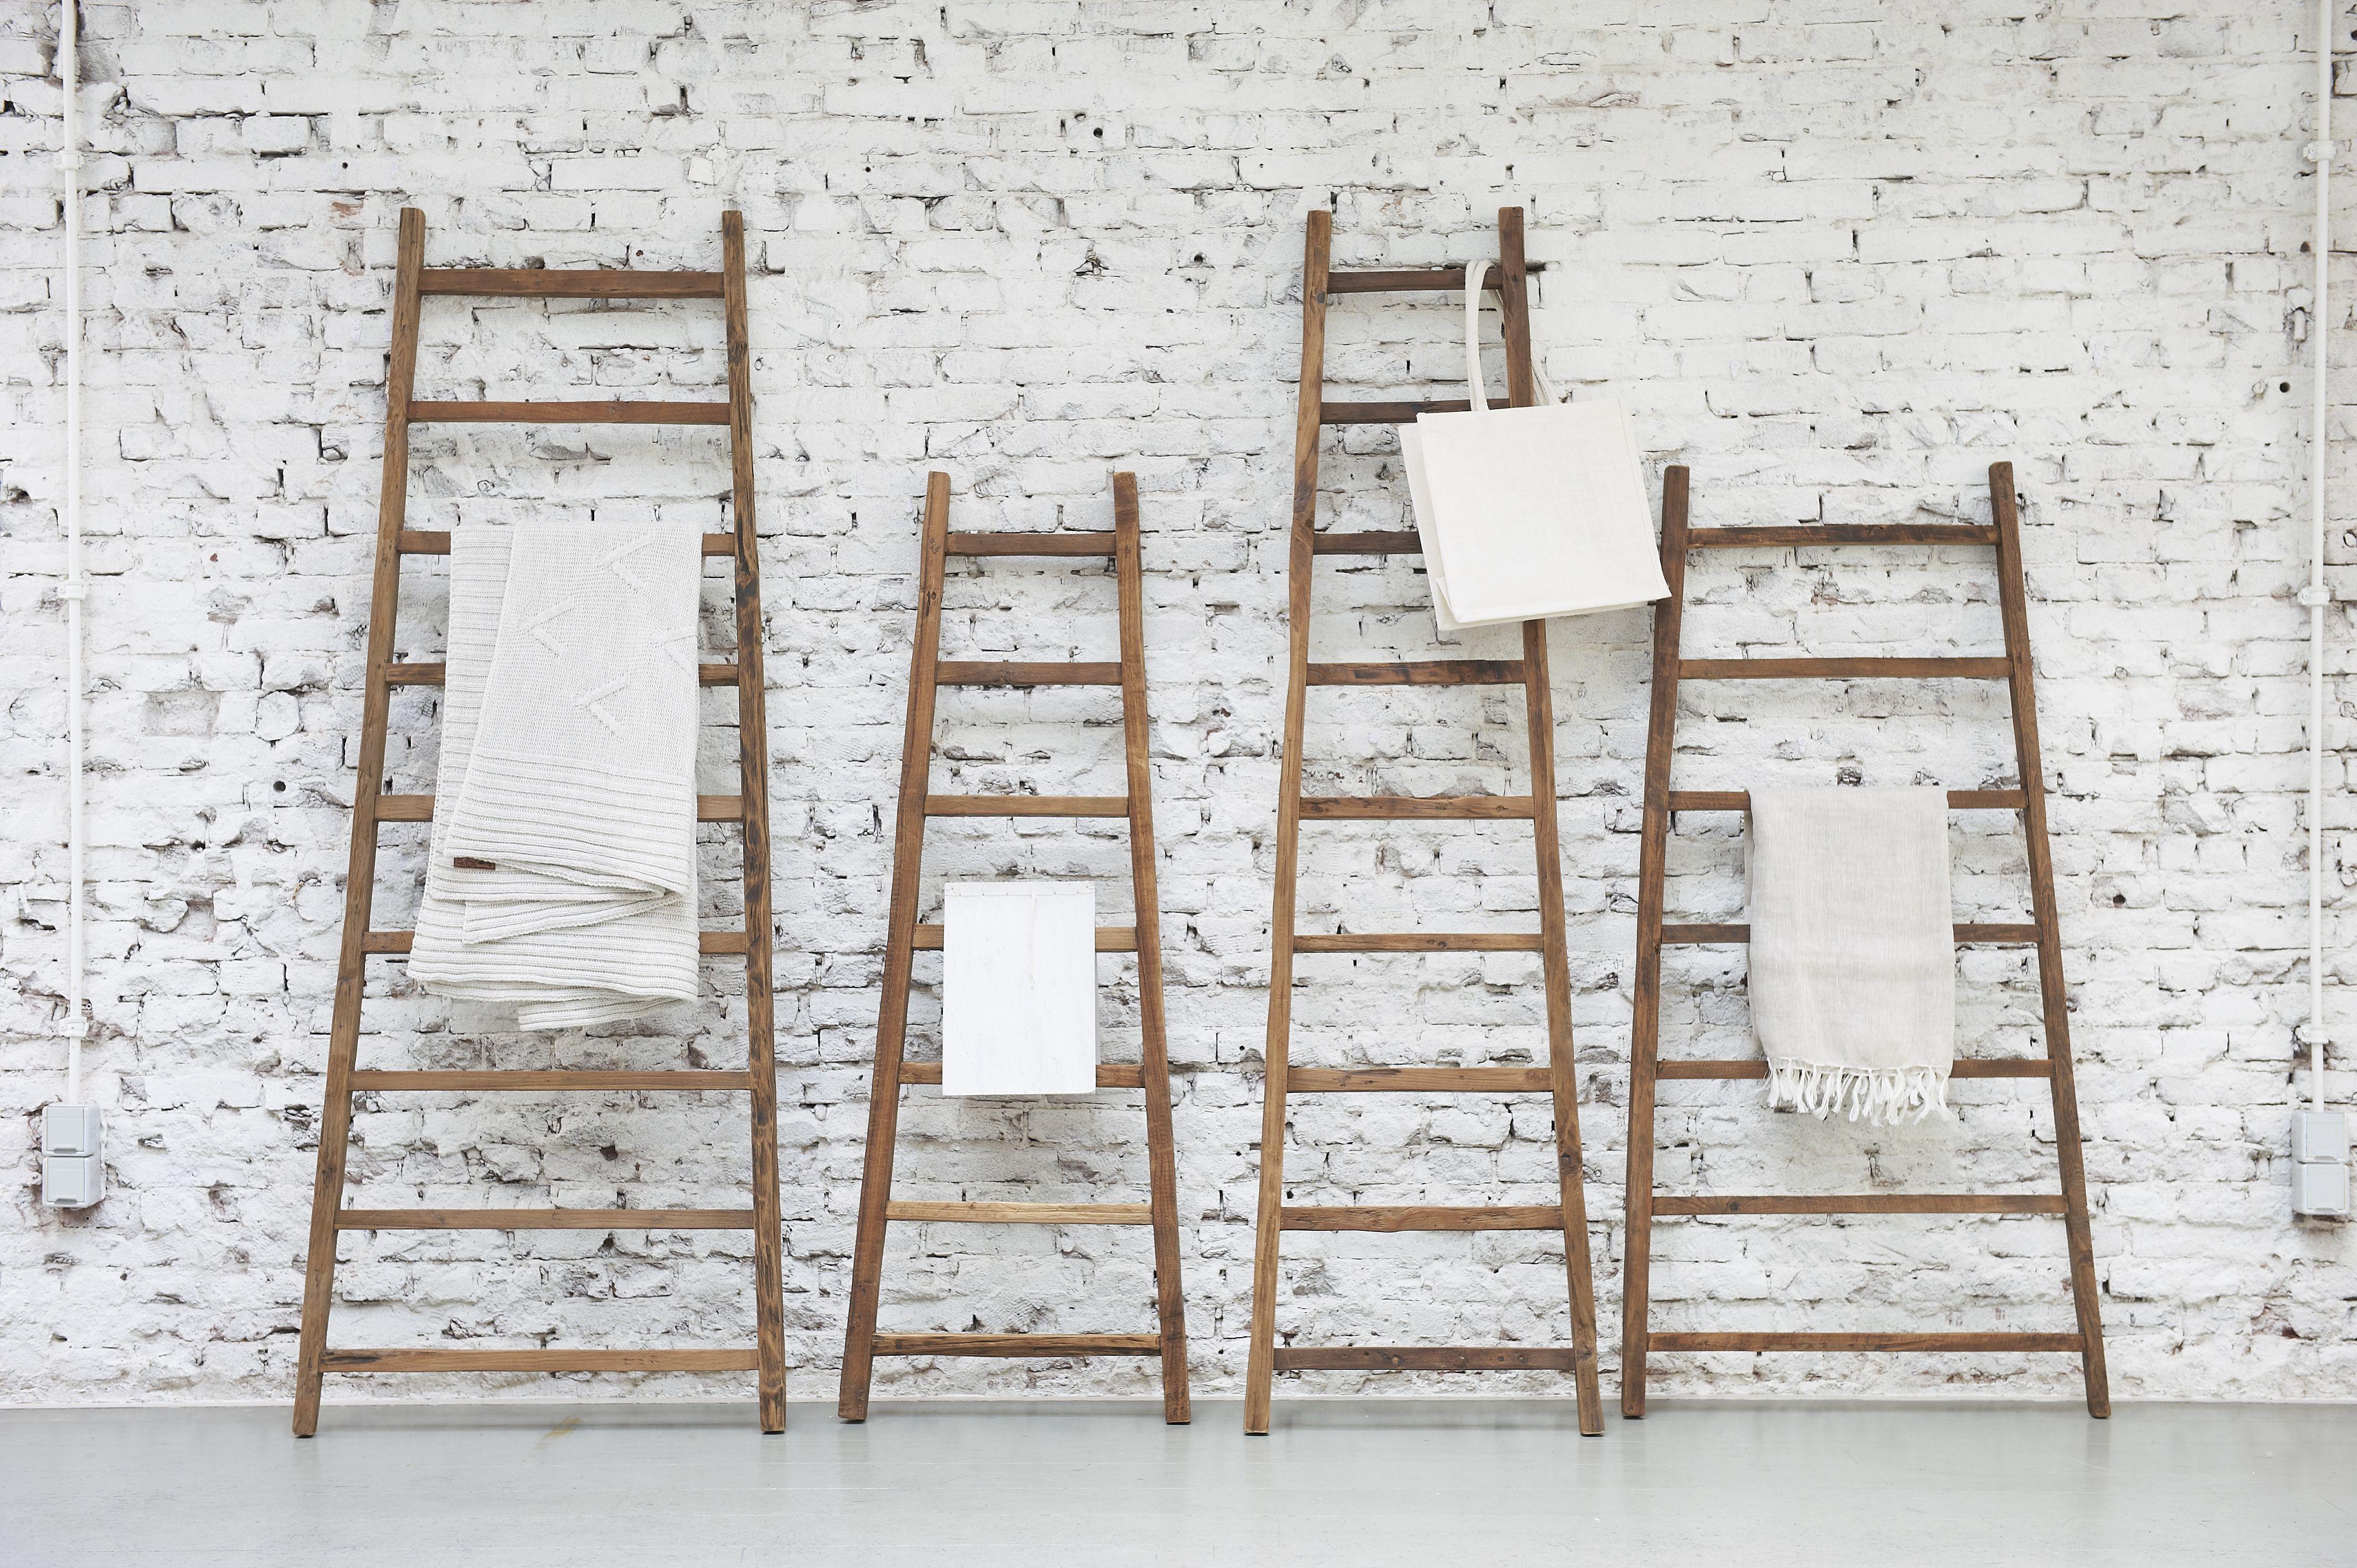 Bamboe Ladder Badkamer : Stoere ladders verkrijgbaar in diverse afmetingen leuk voor